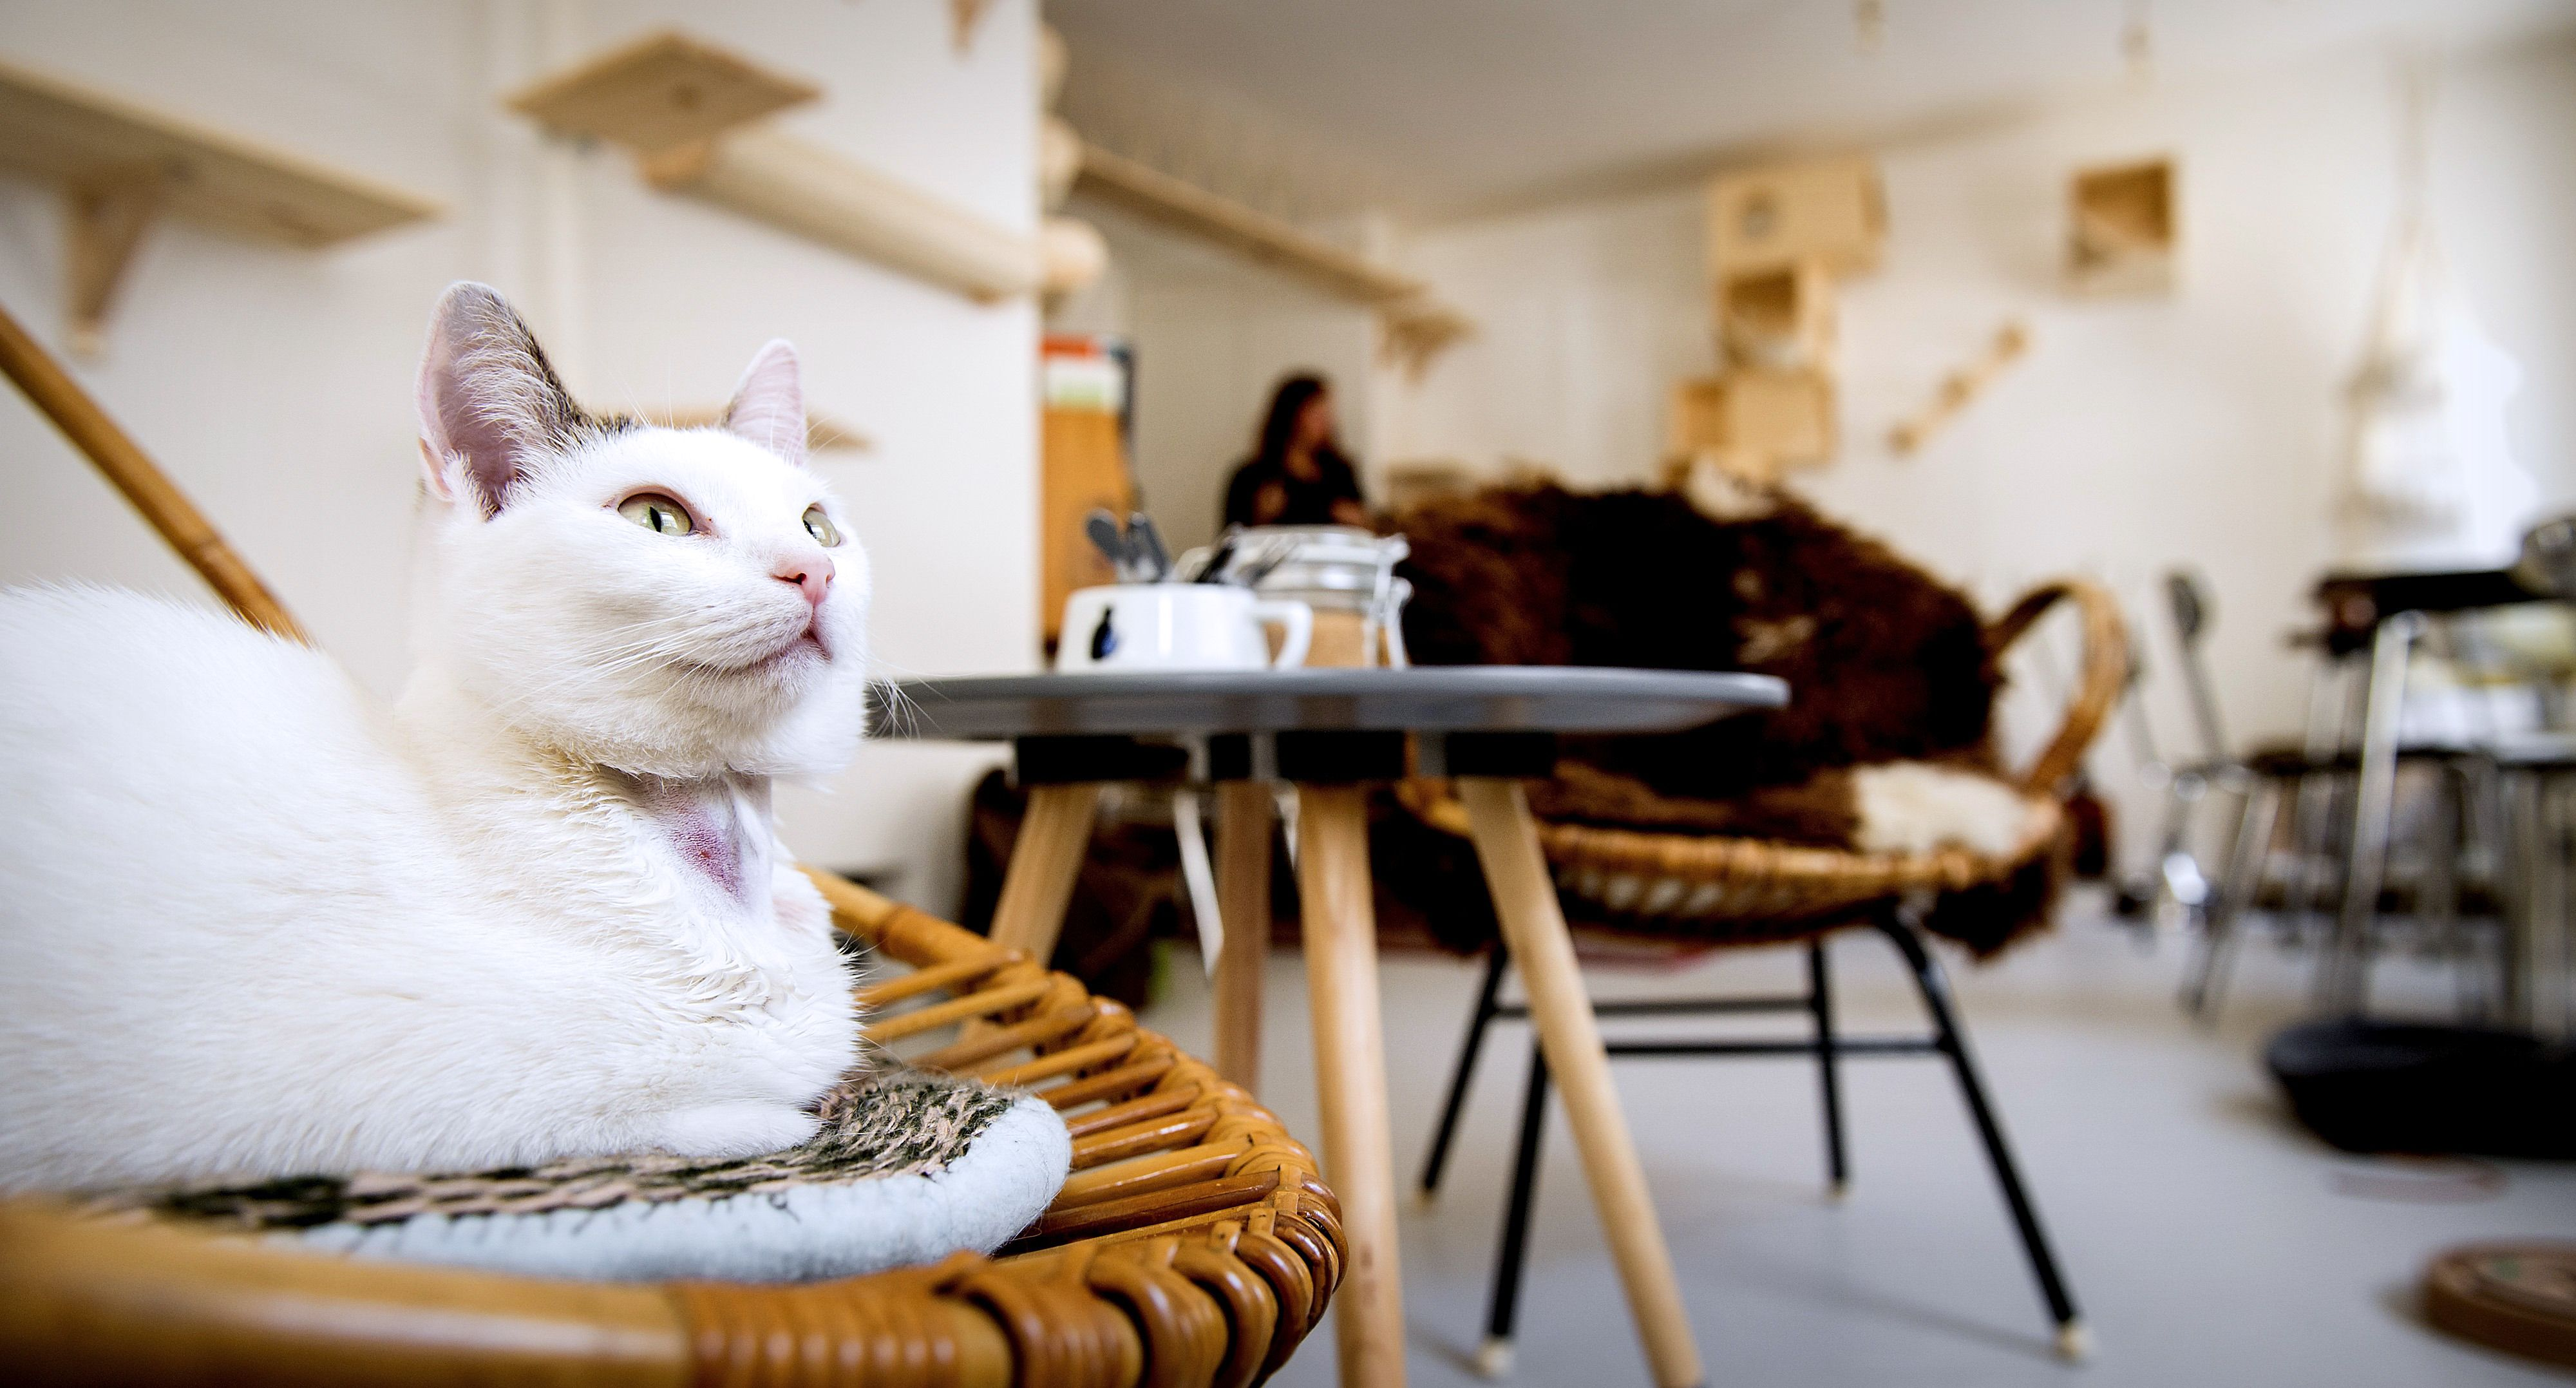 Seekor kucing duduk di atas kursi di kedai kopi bertema